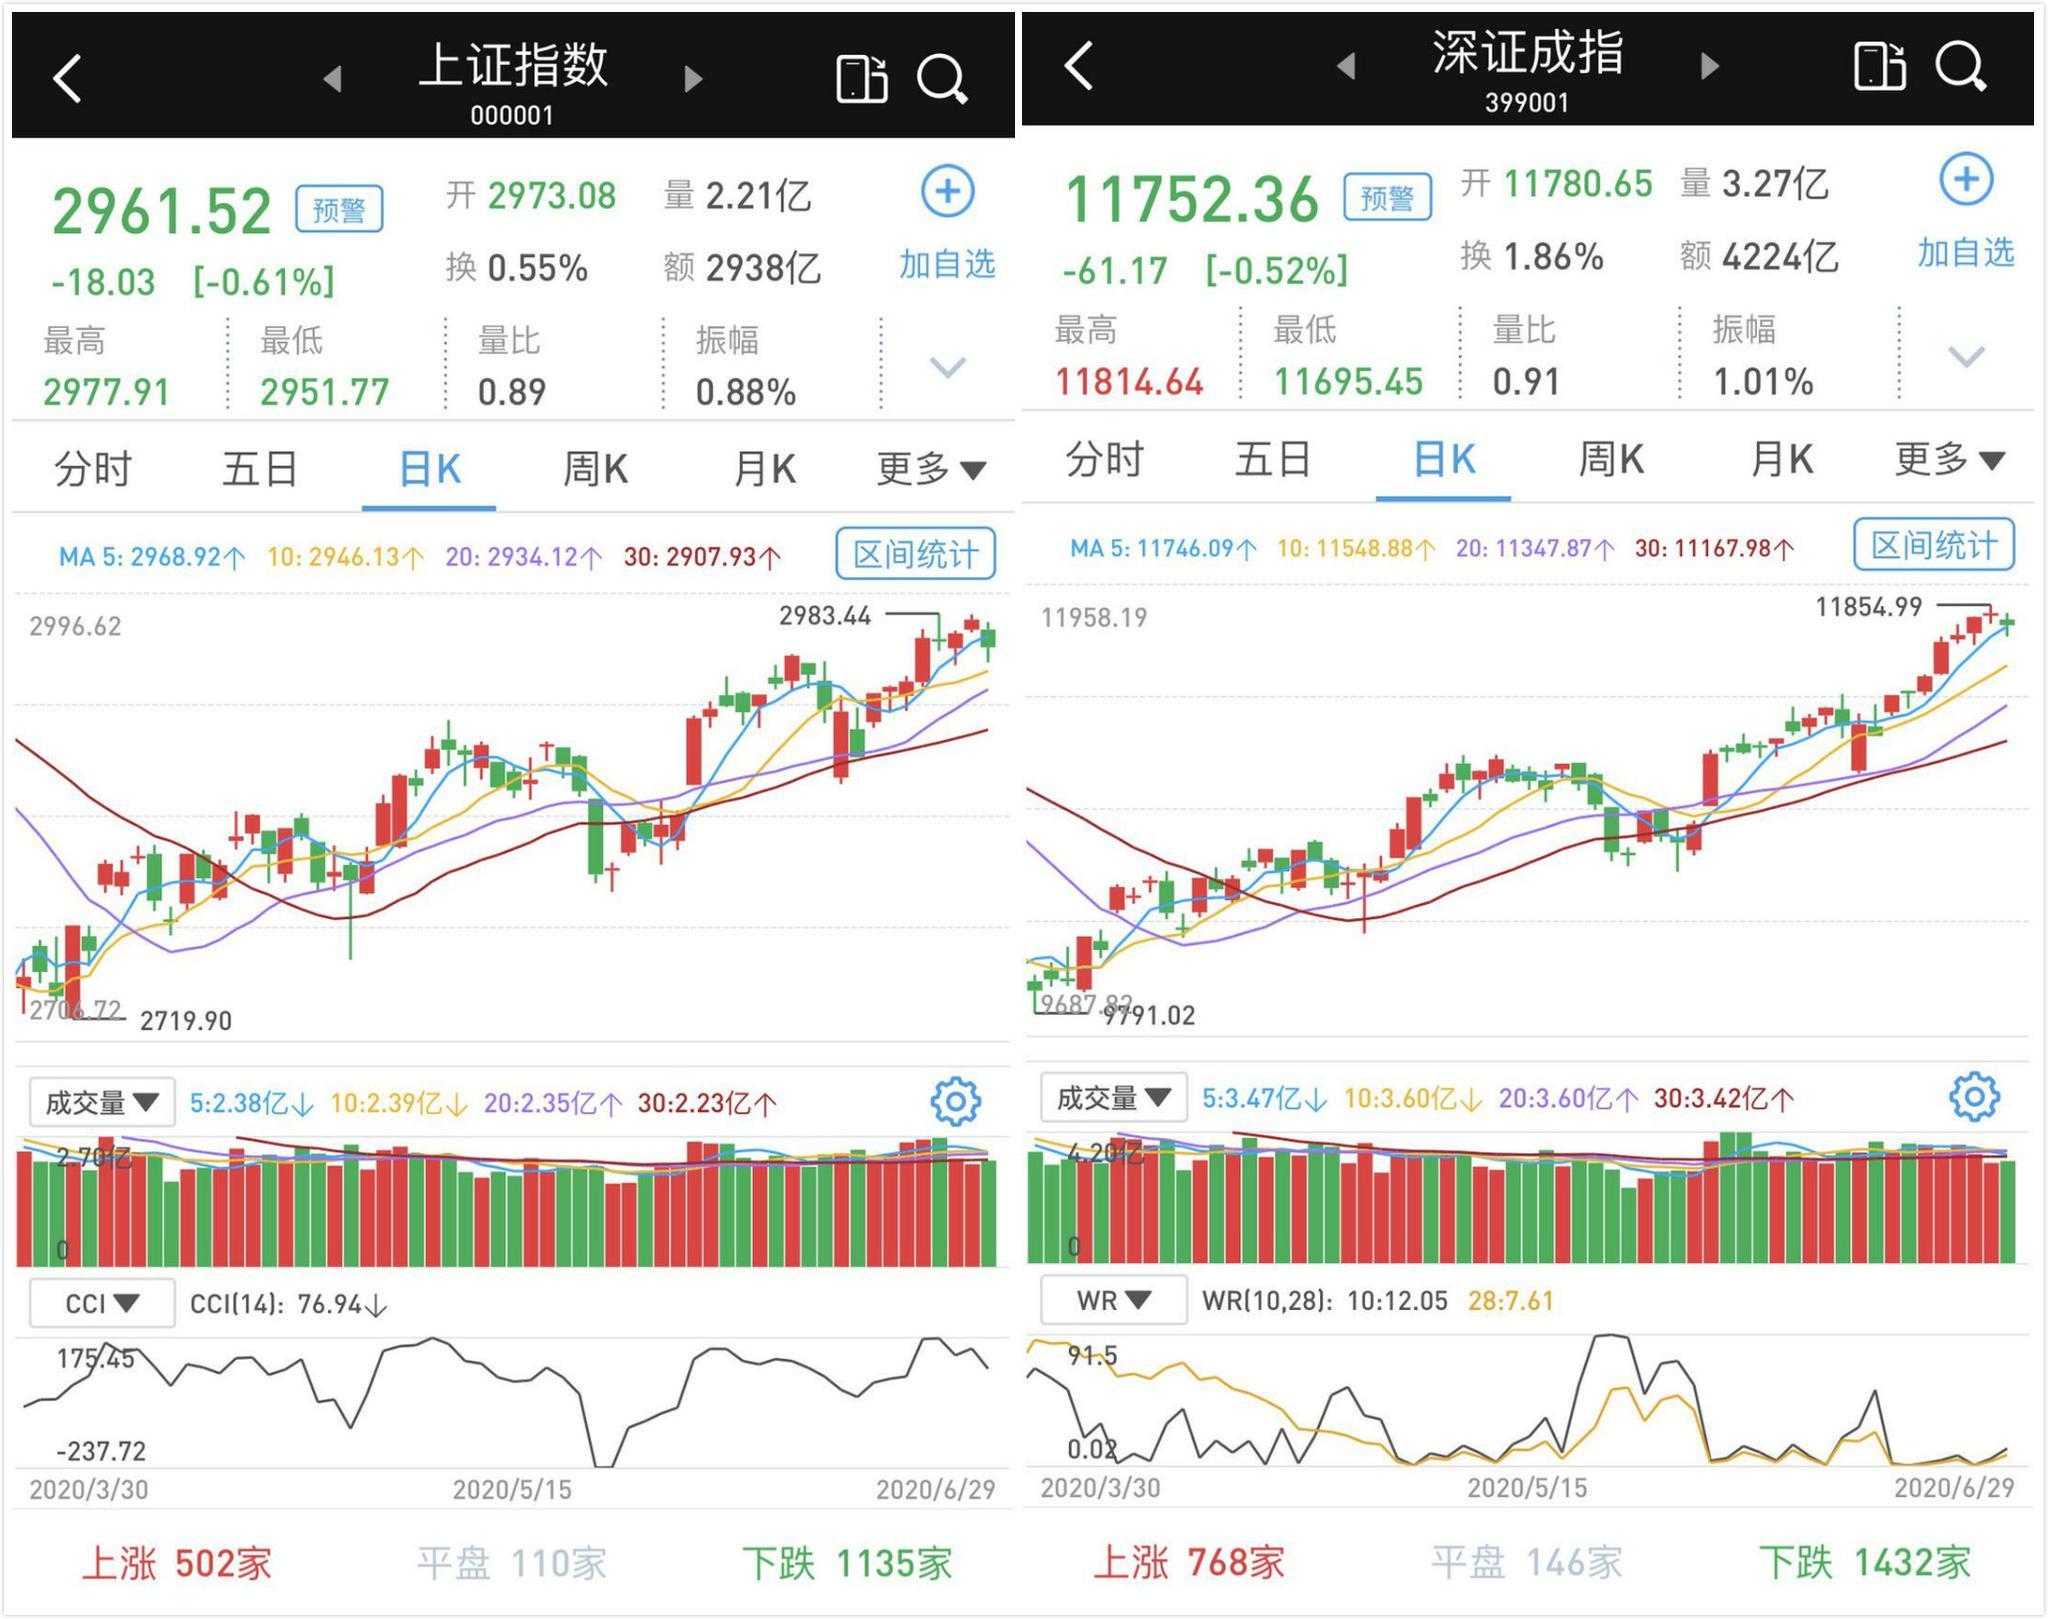 A股市场低开低走:多数券商股深幅调整 三大指数收跌